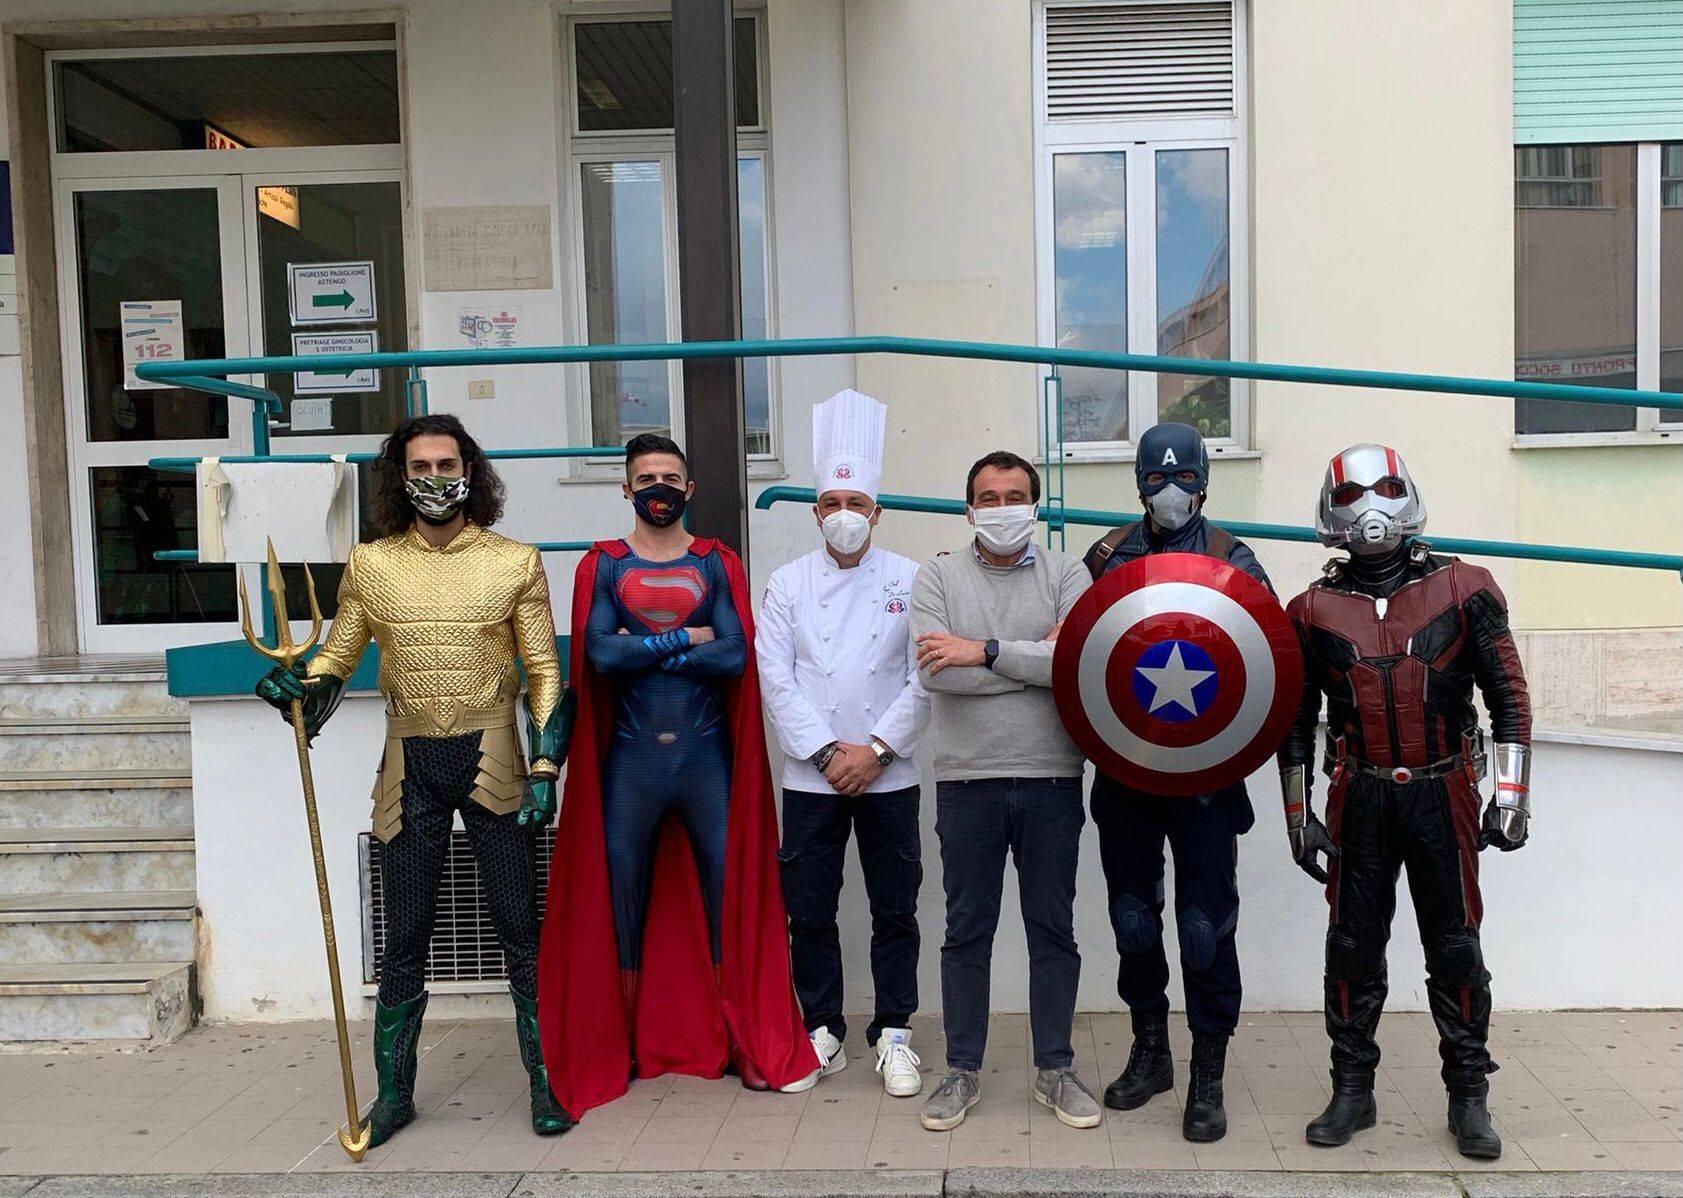 Supereroi lasagne al San Paolo